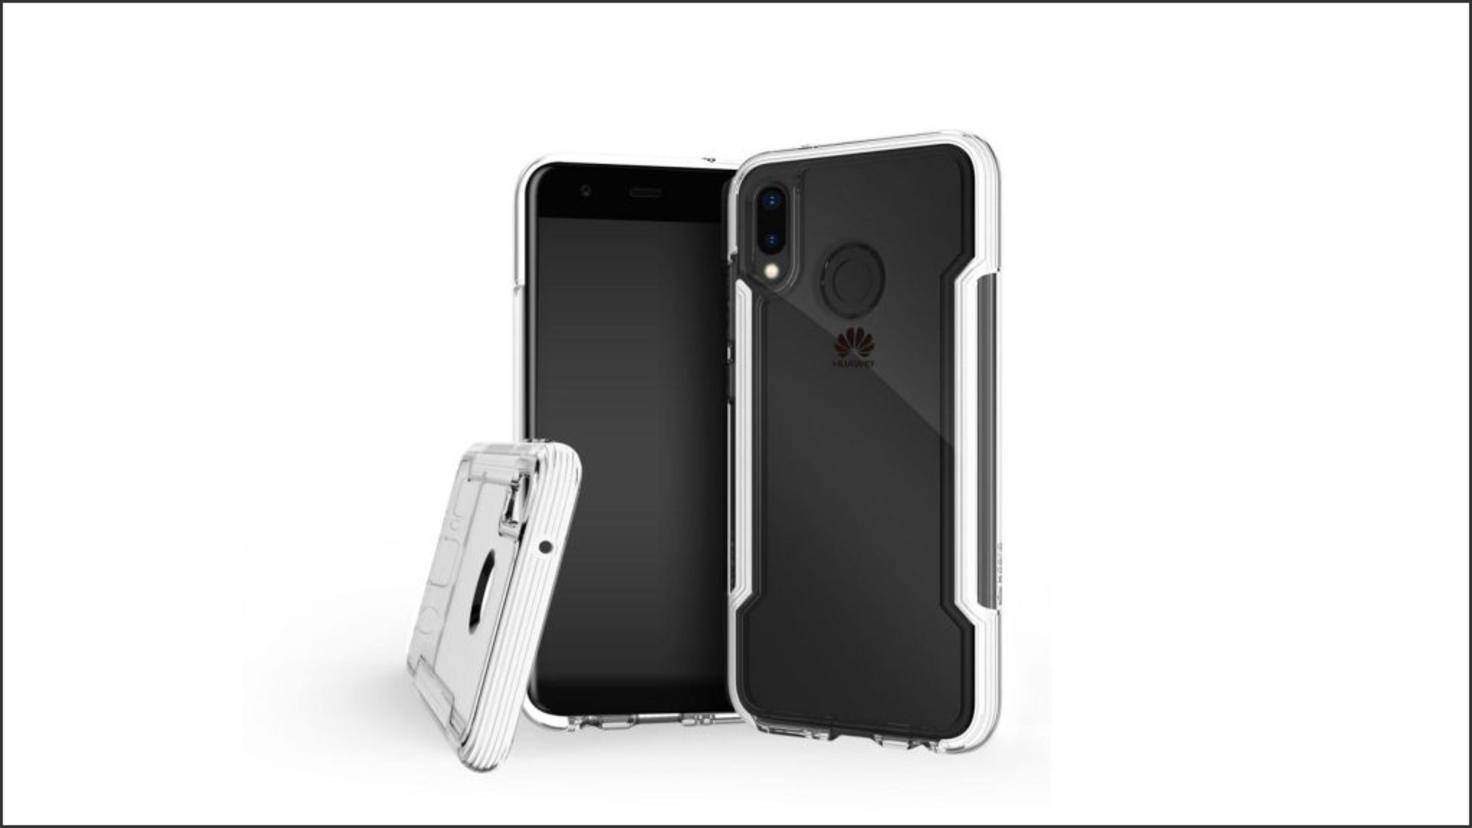 Huawei-P20-Lite-Case-Leak